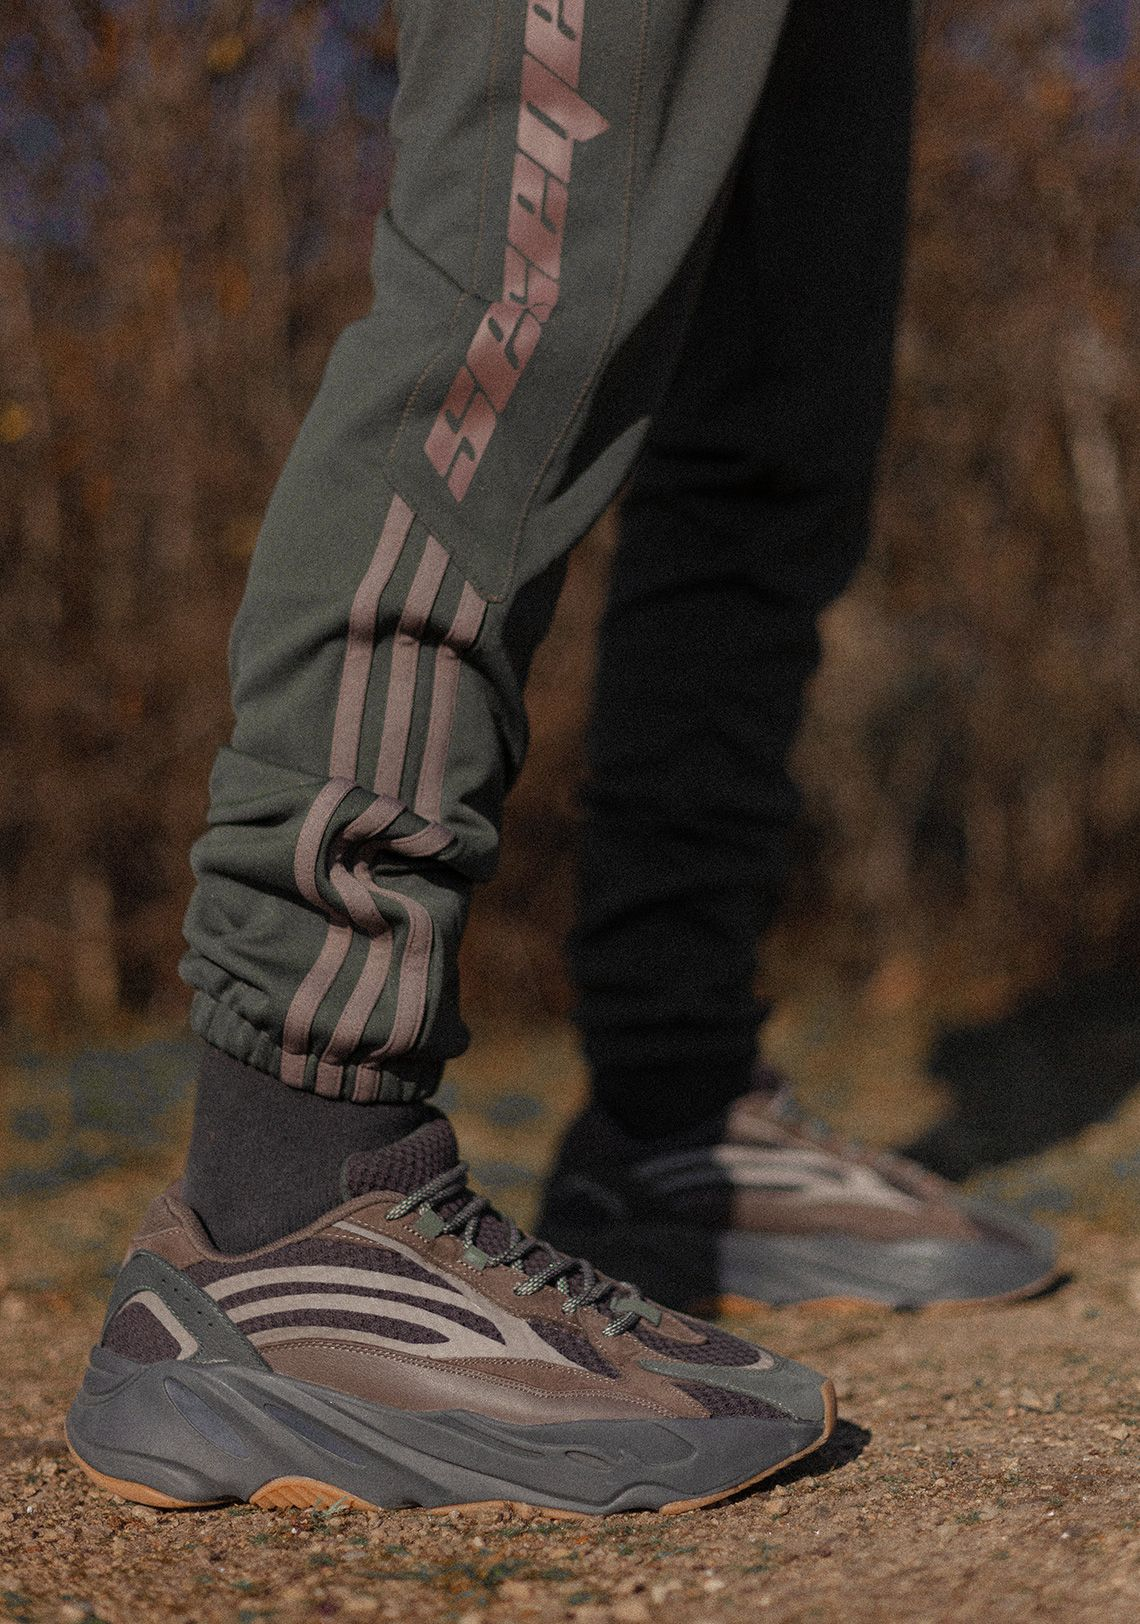 Adidas Yeezy 700 V2 Geode Eg6860 Release Info Sneakernews Com Adidas Yeezy Yeezy Yeezy Outfit